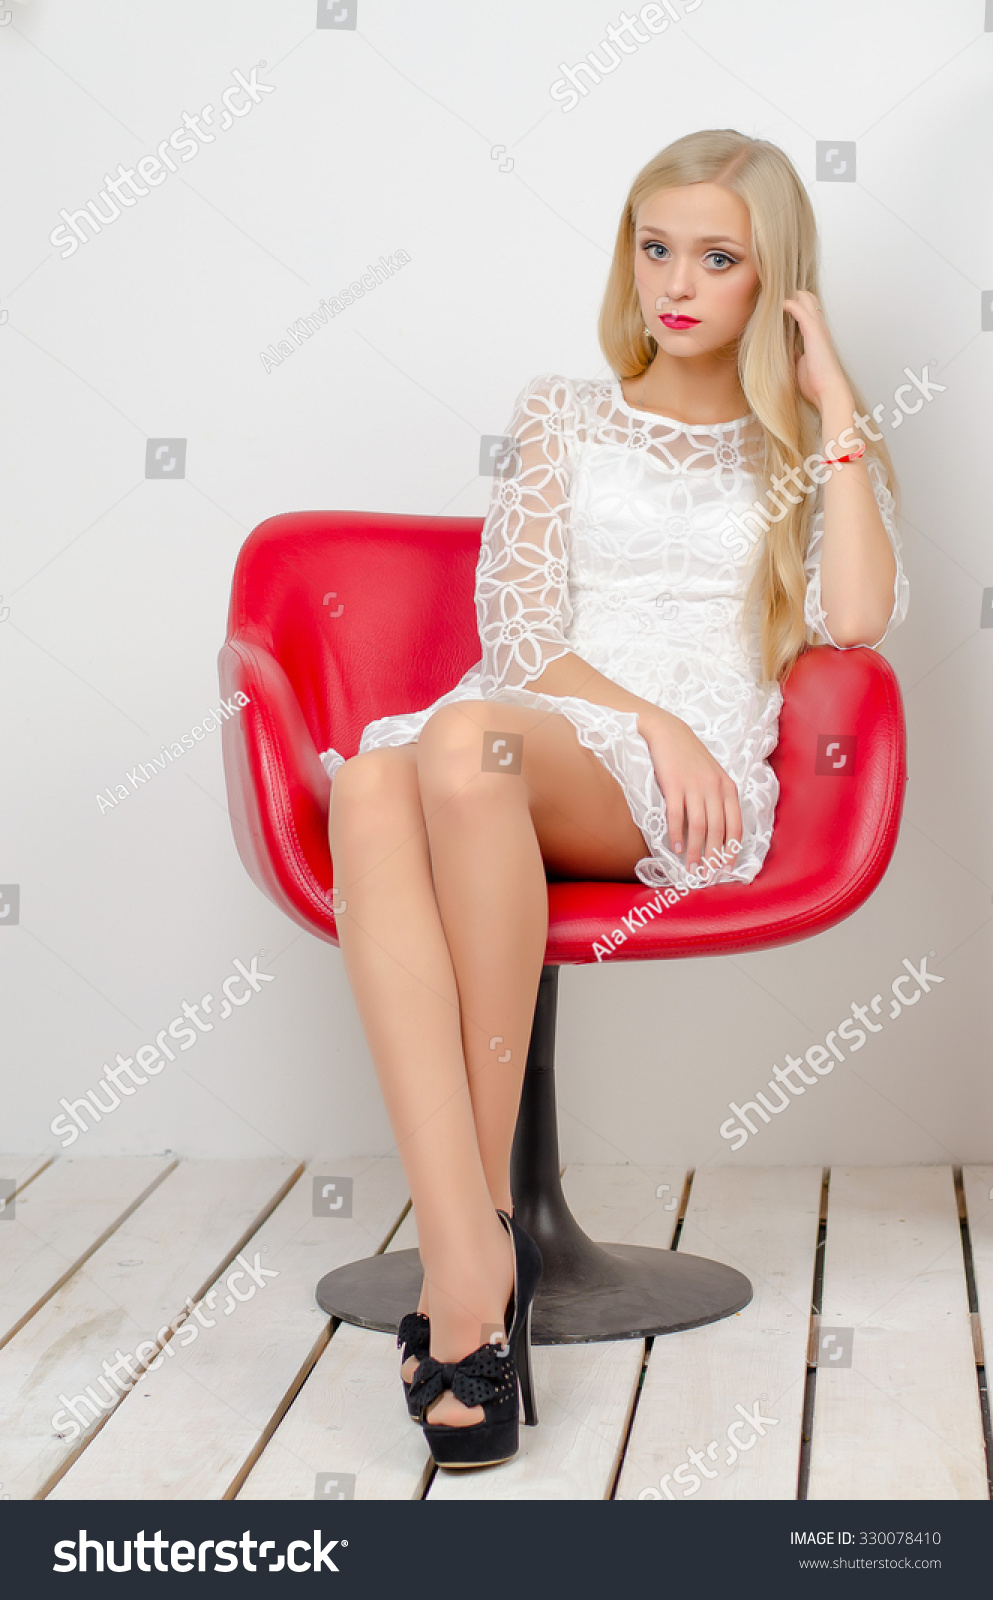 Young girl in heels pics 543